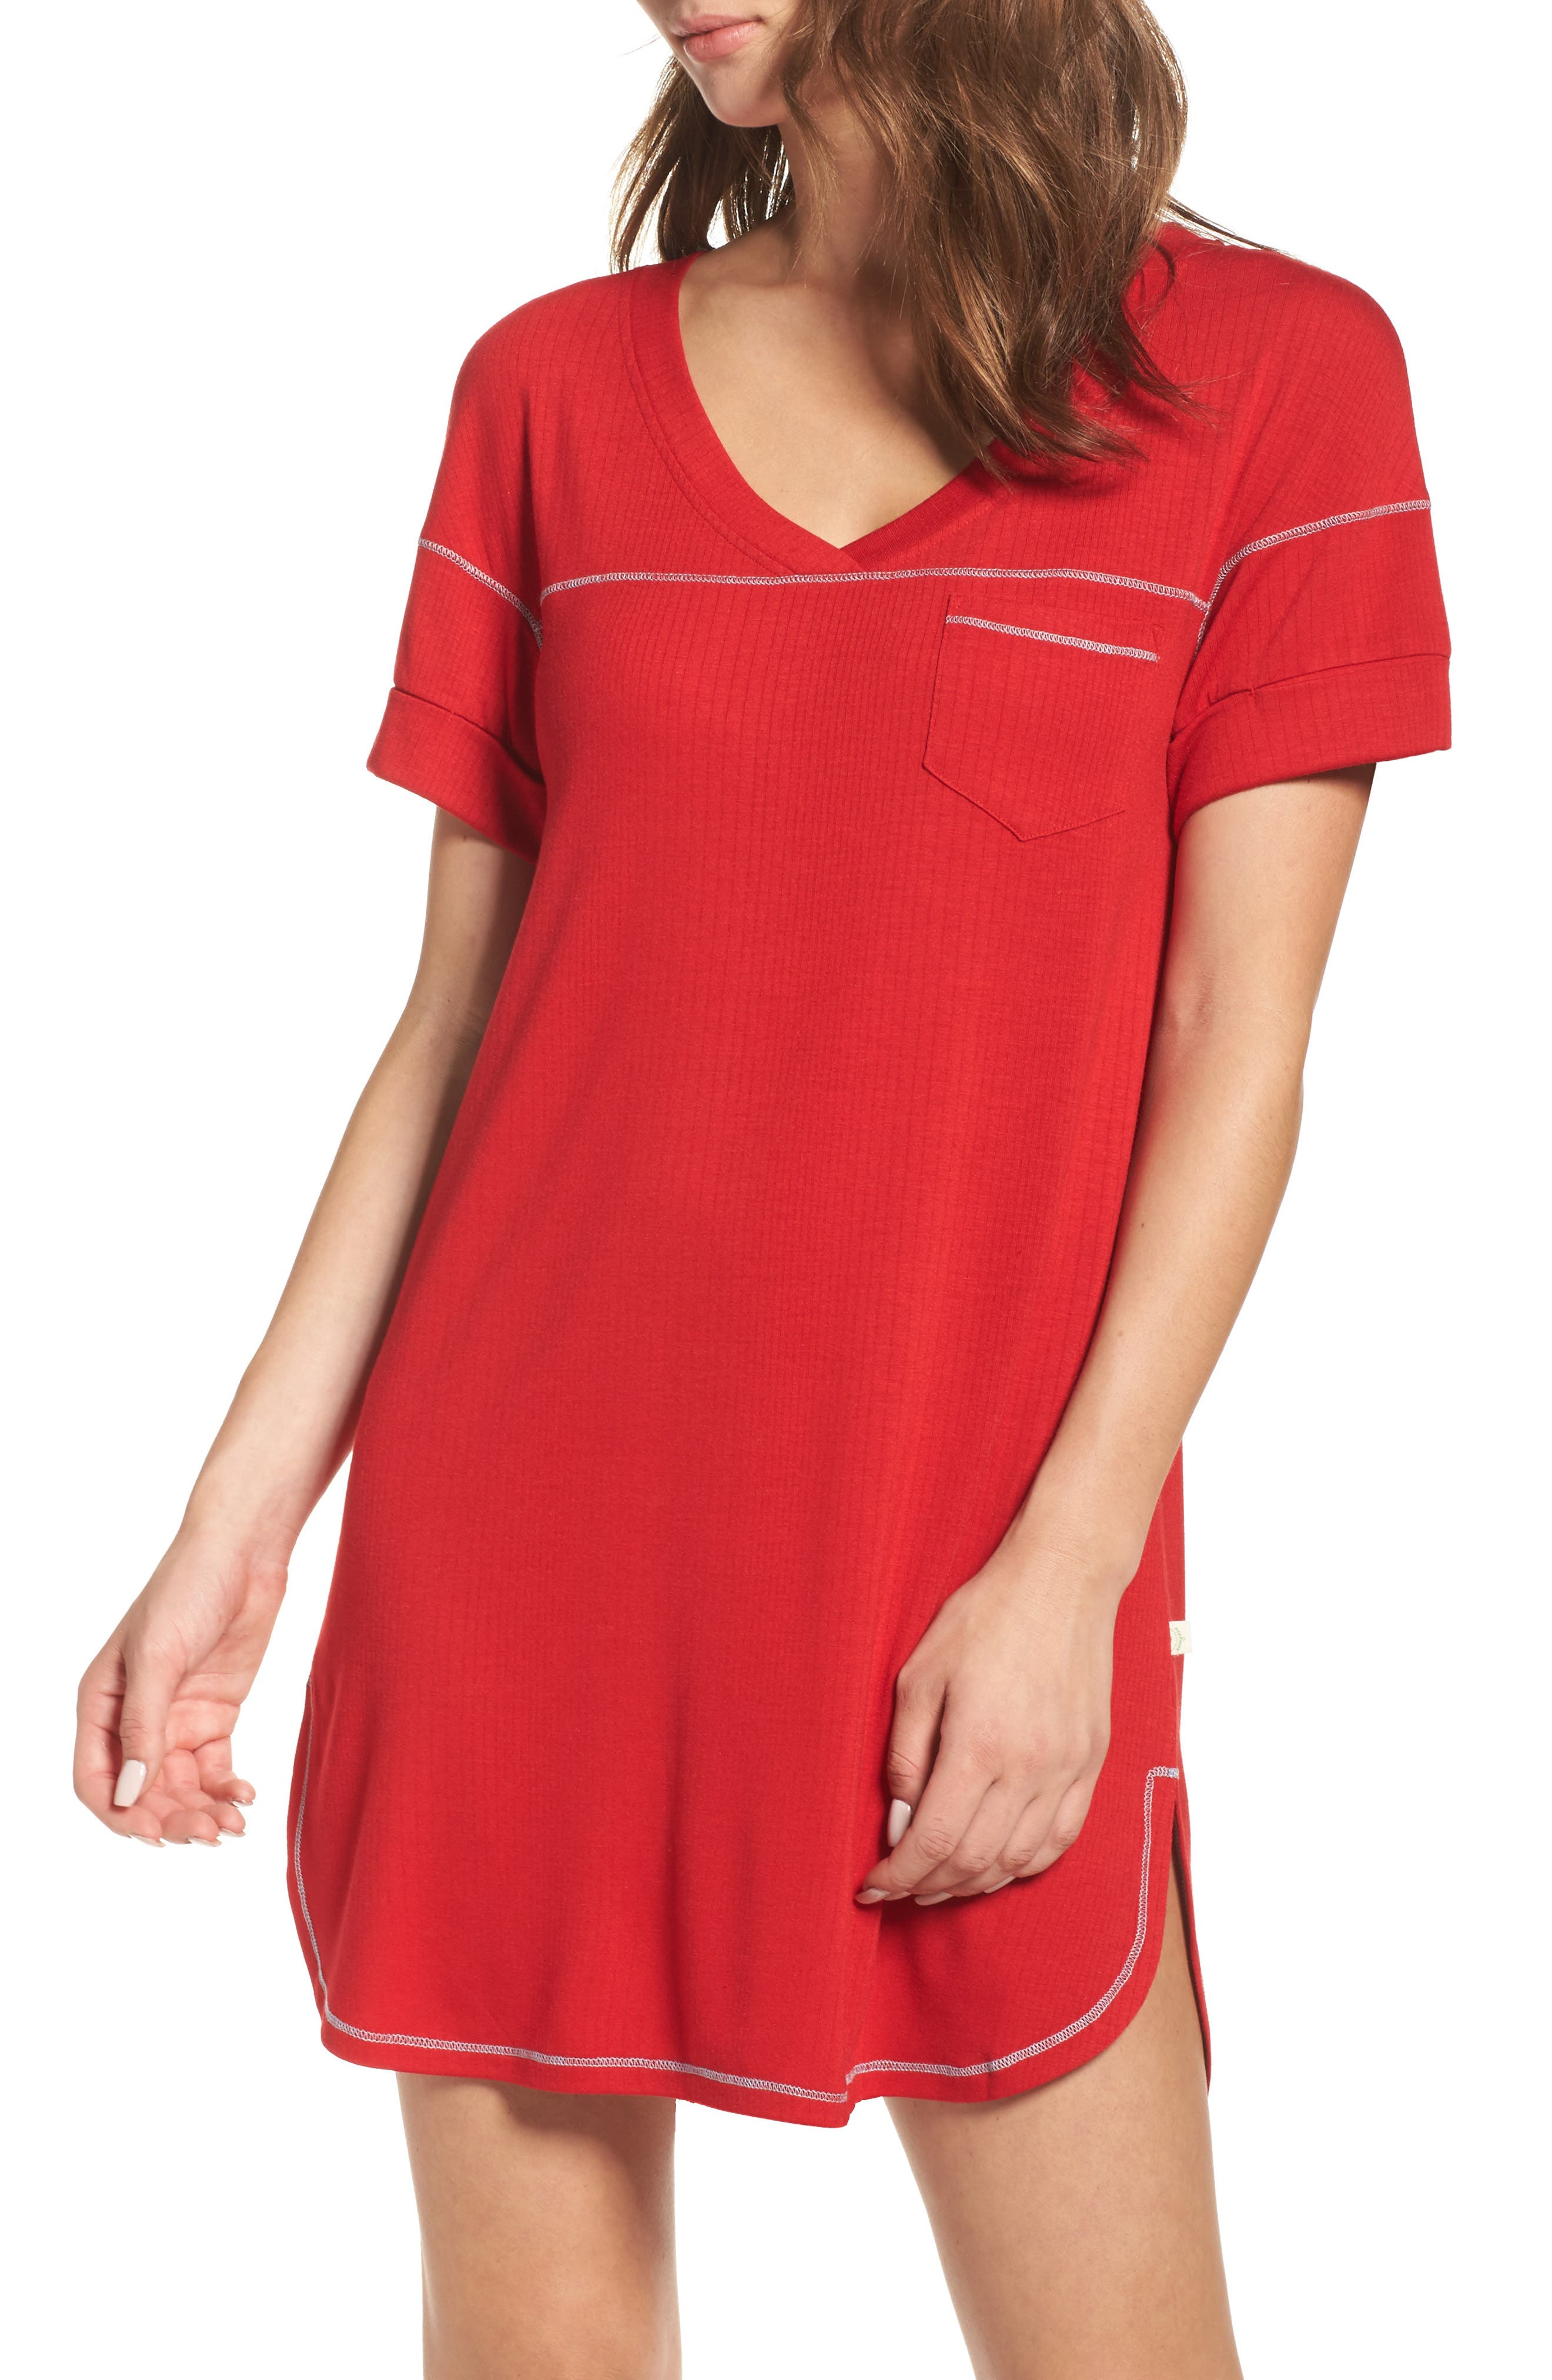 Alternate Image 1 Selected - Honeydew Intimates Rib Sleep Shirt